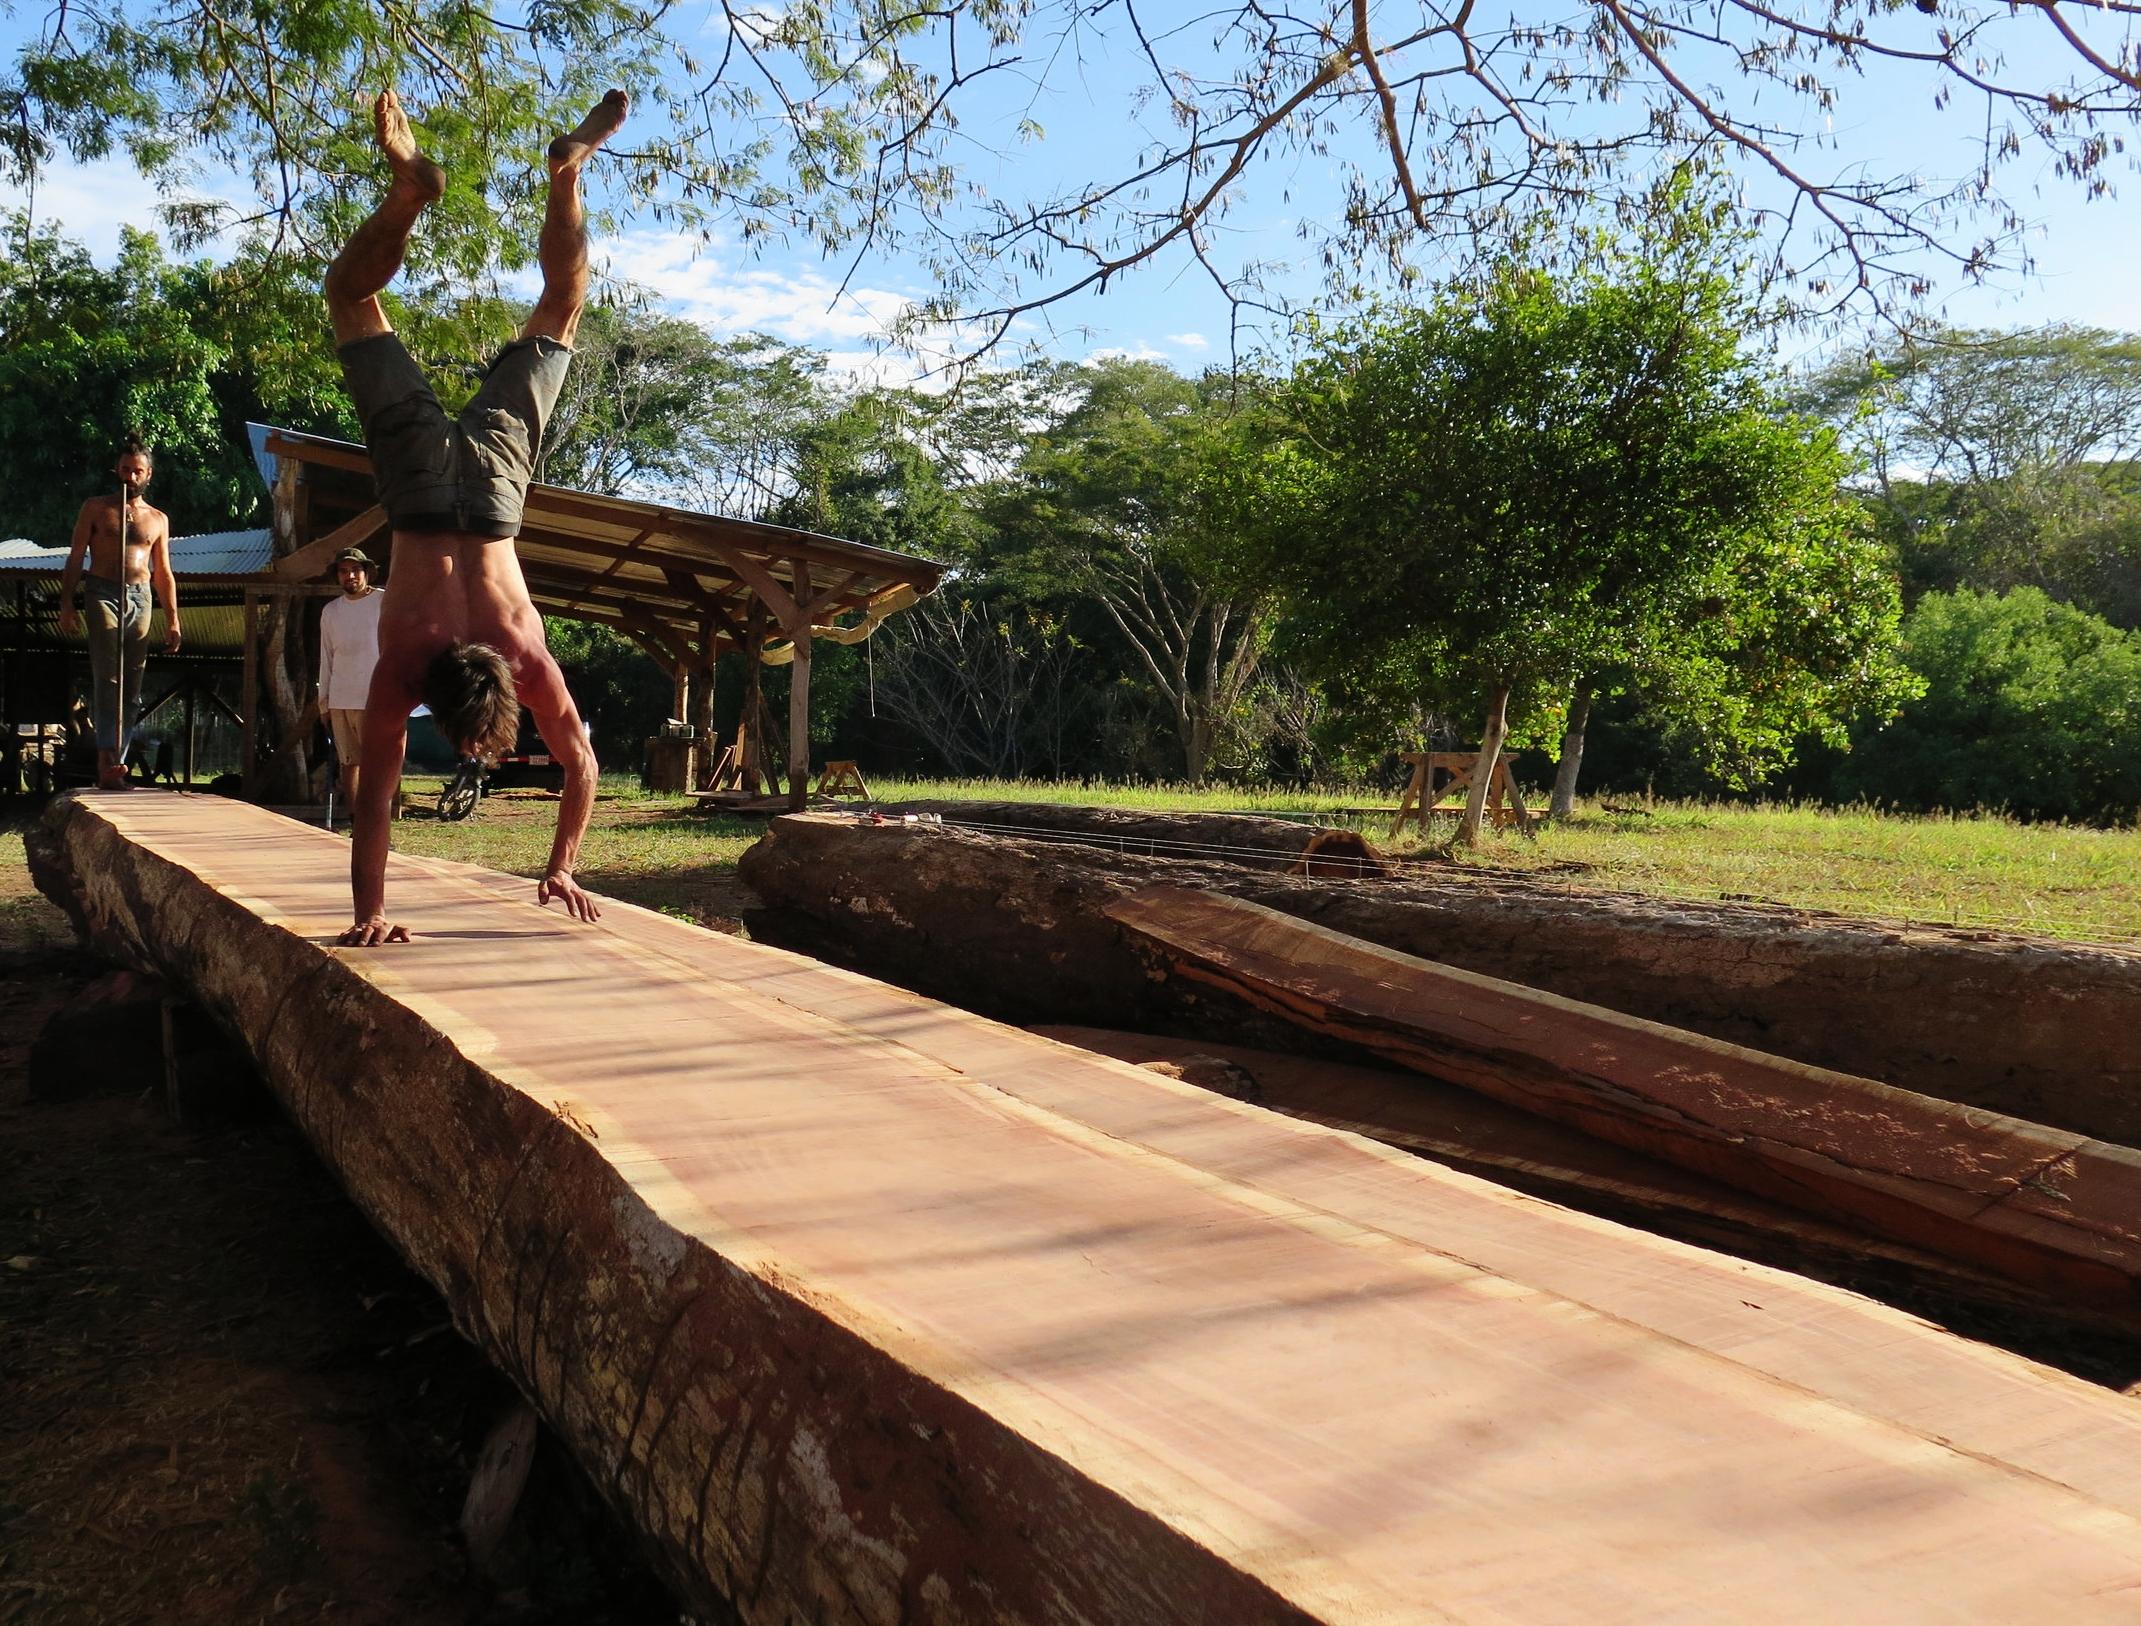 Melle celebrates milling the largest hardwood at the shipyard...